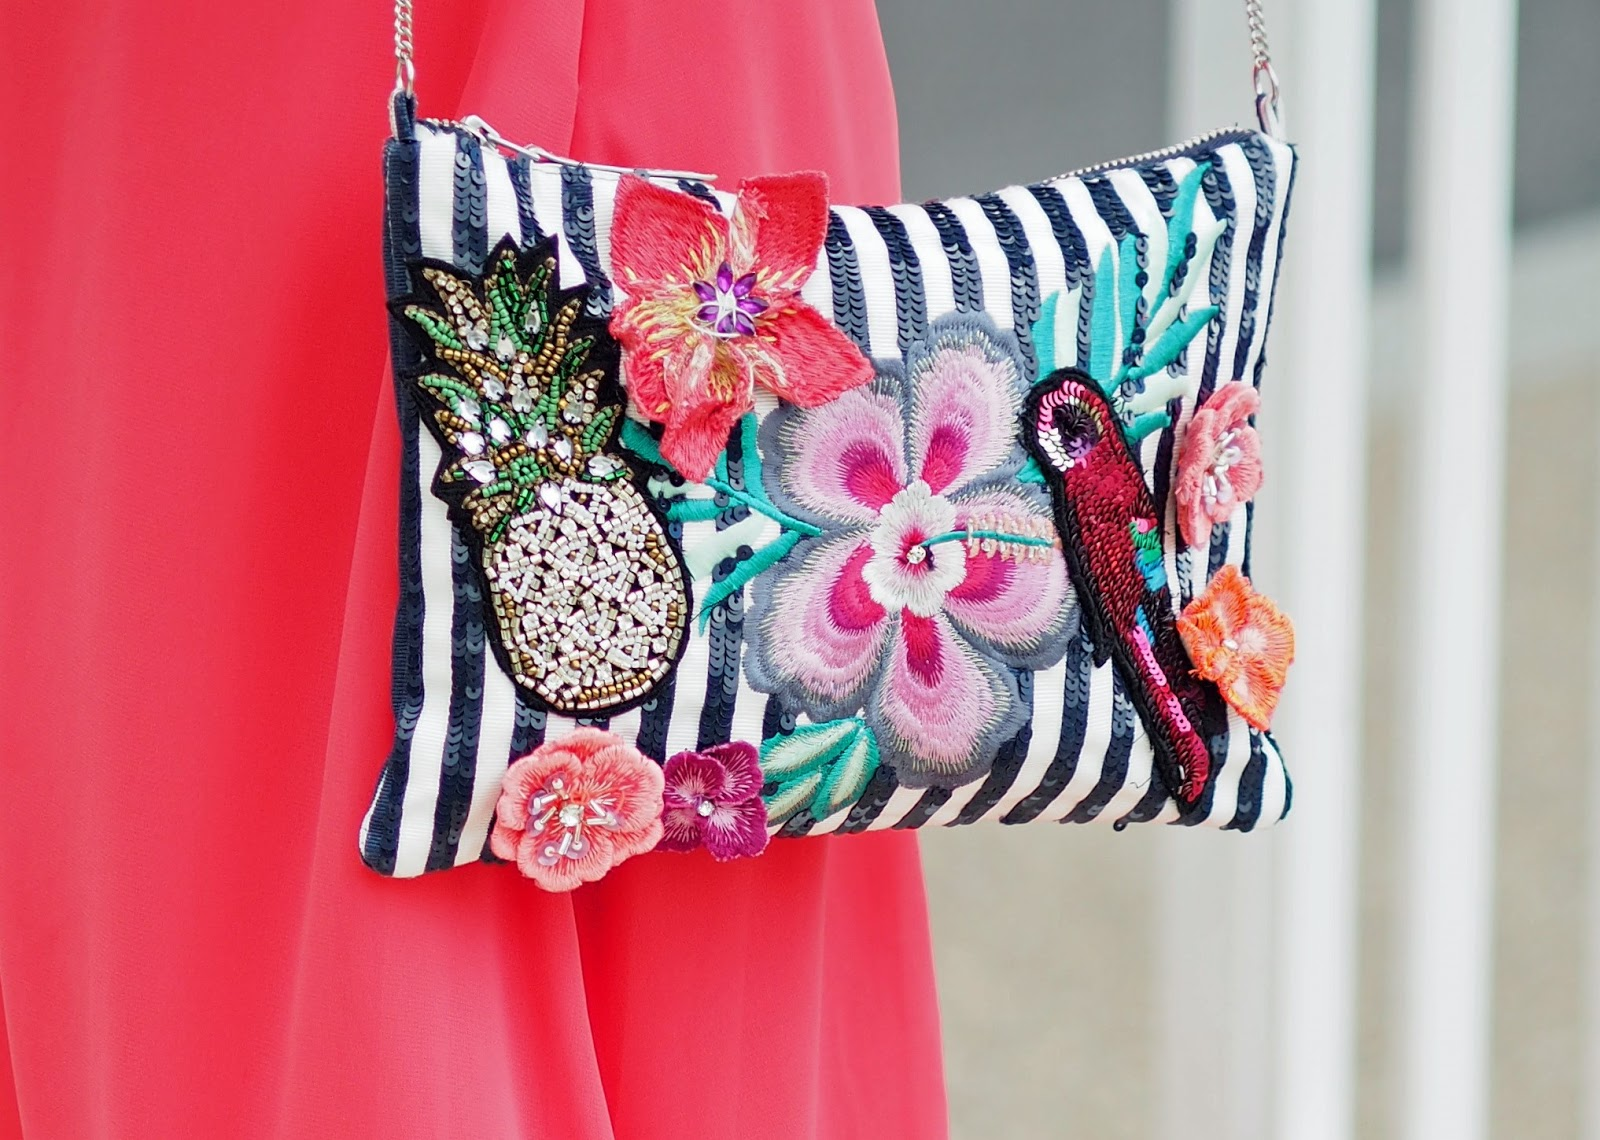 beaded-sequin-bag-pineapple-parrot